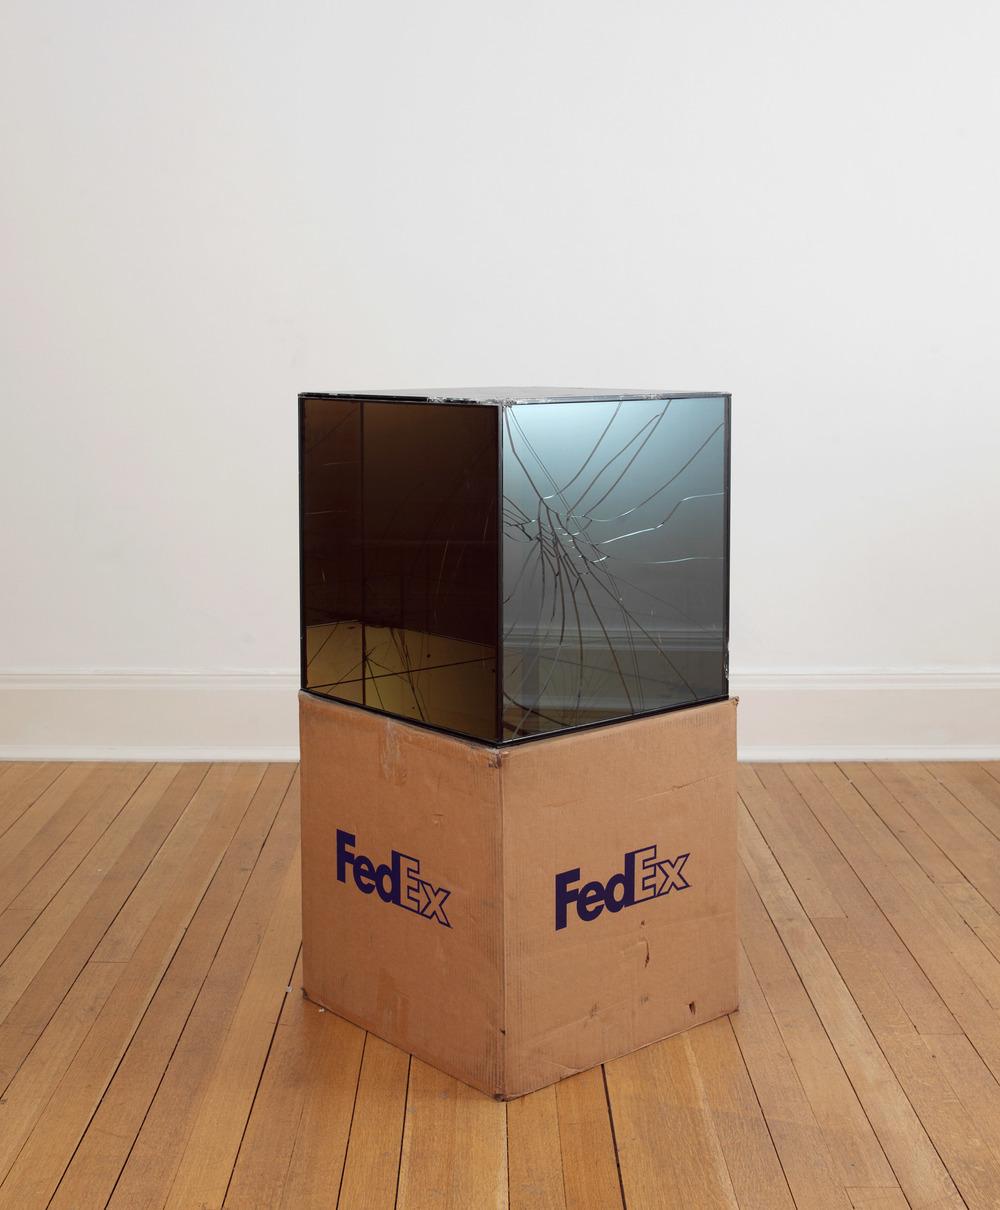 FedEx® Large Kraft Box  © 2008 FEDEX 330510 REV 6/08 GP, International Priority, Los Angeles–London trk#868587728072, October 02–05, 2009    2009–   Laminated Mirropane, FedEx shipping box, accrued FedEx shipping and tracking labels, silicone, metal, tape  20 x 20 x 20 inches   FedEx Glass Works, 2007–